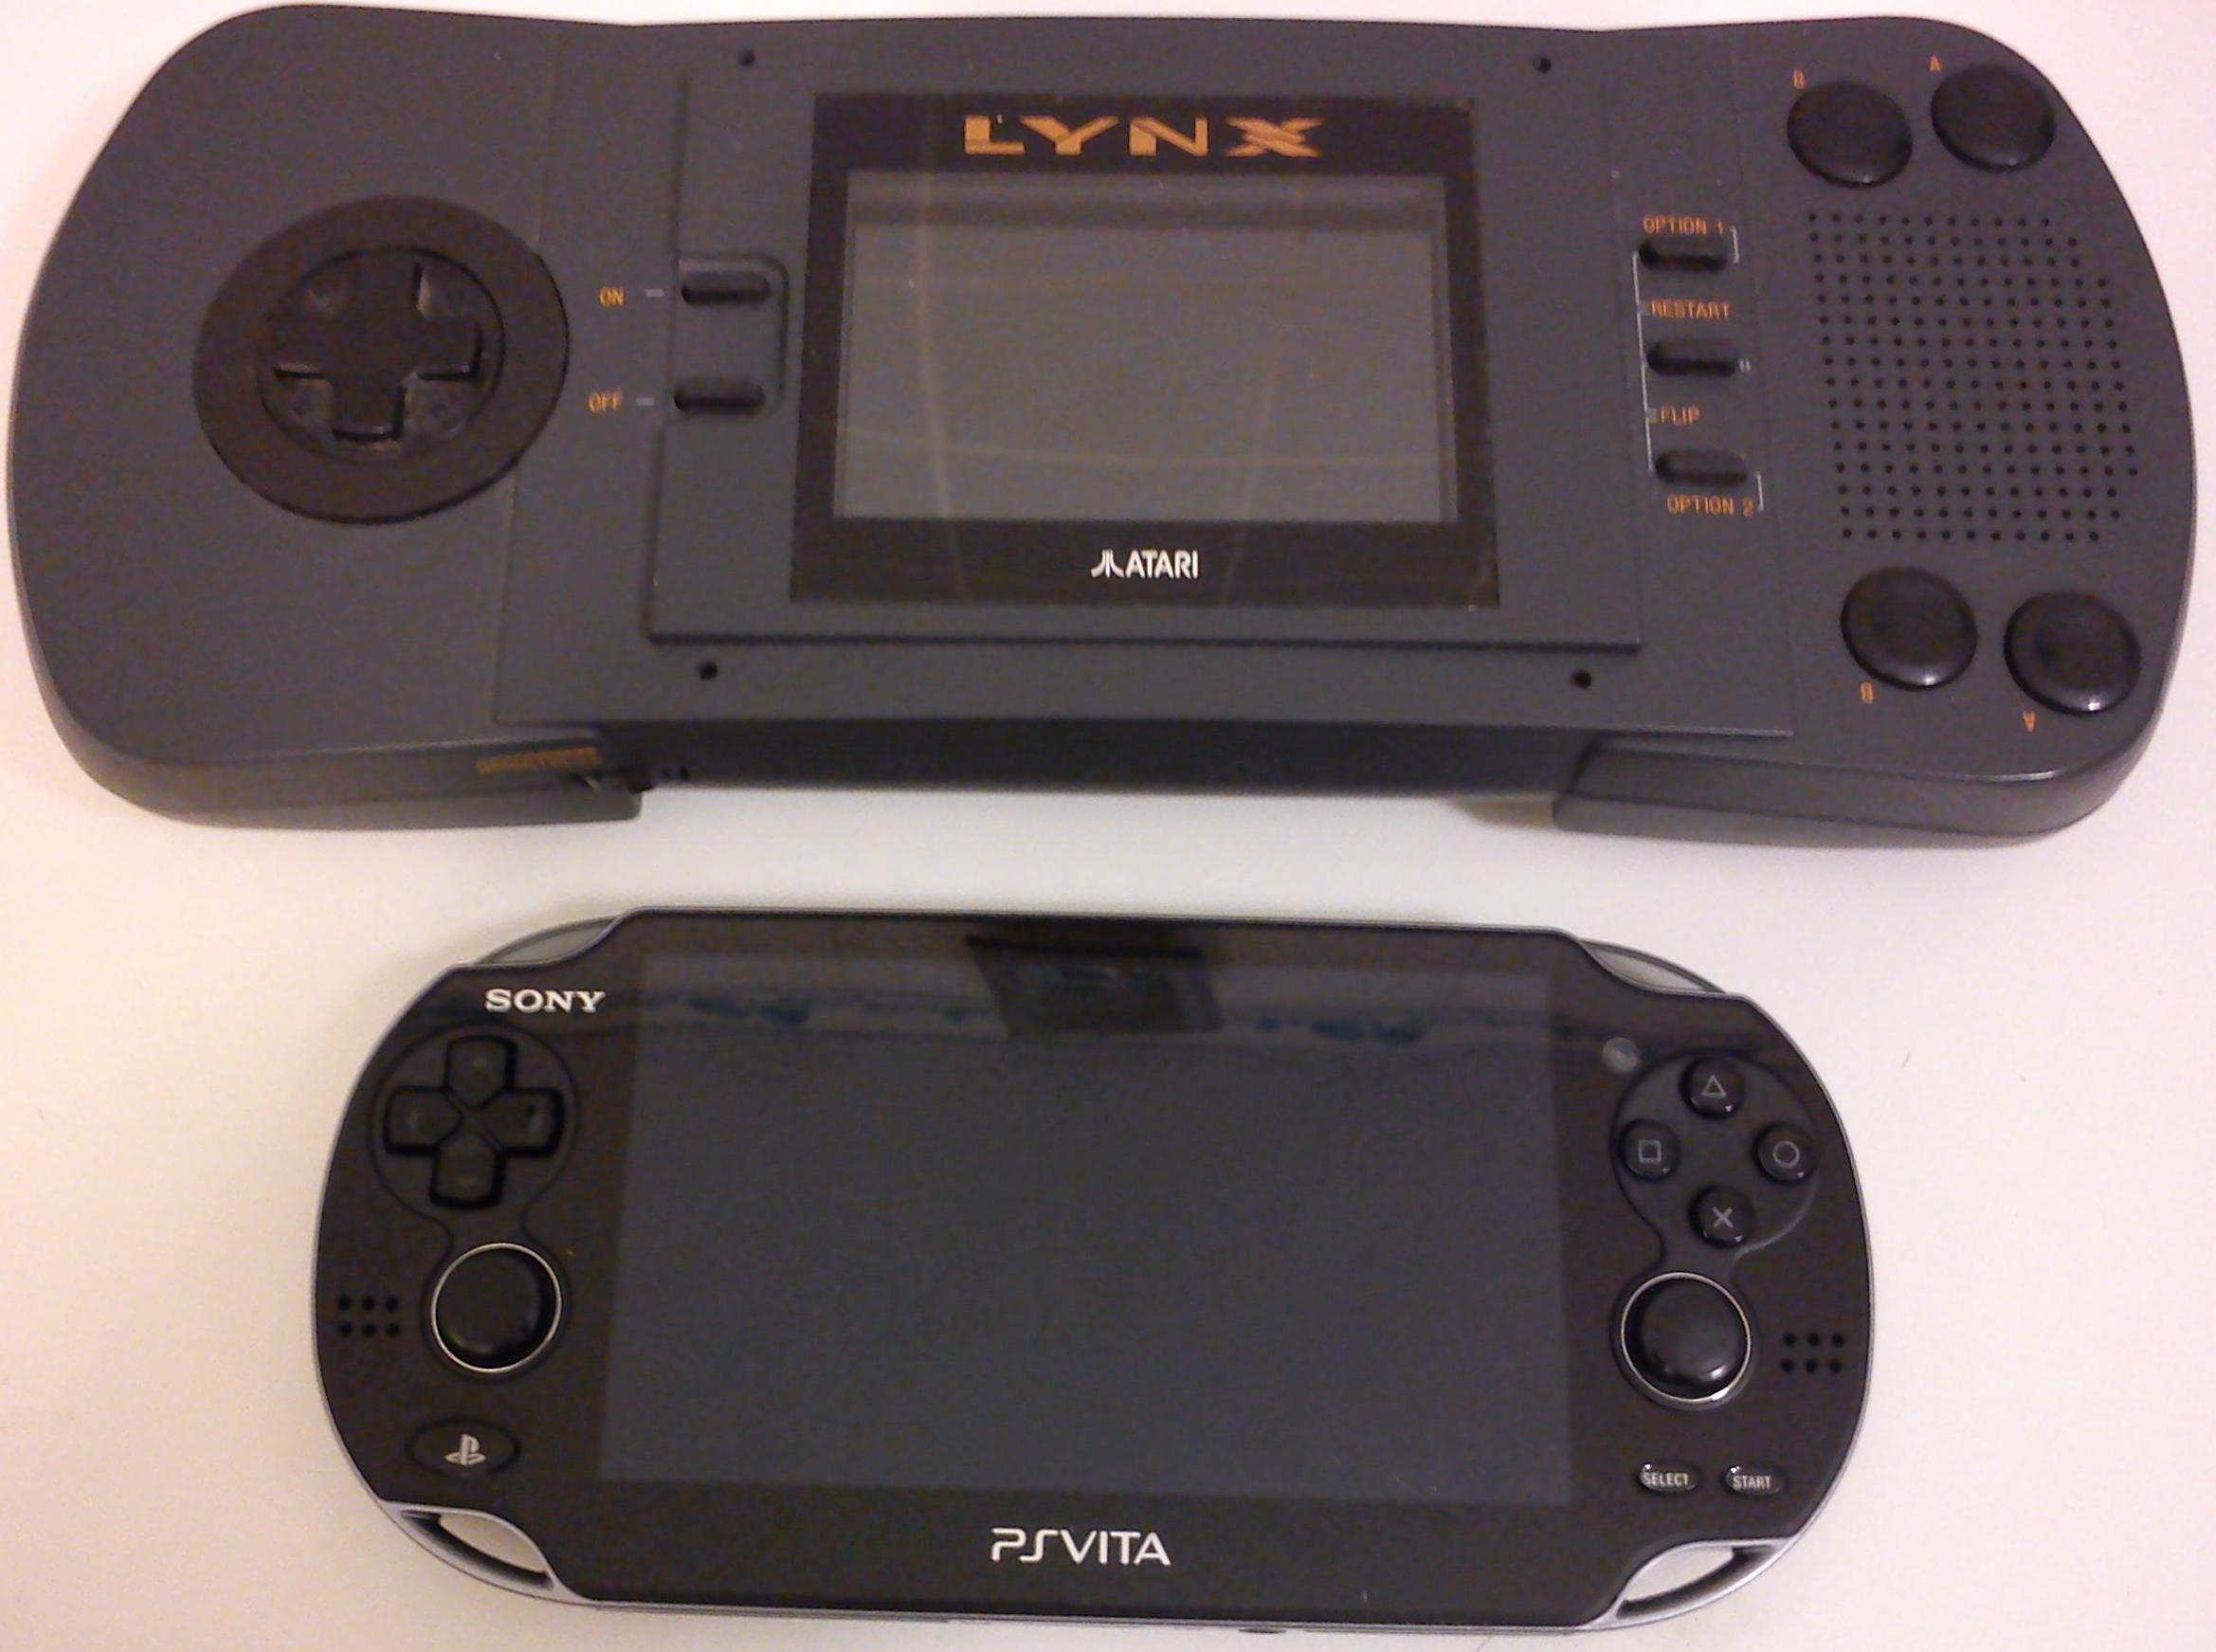 Lynx et Ps Vita